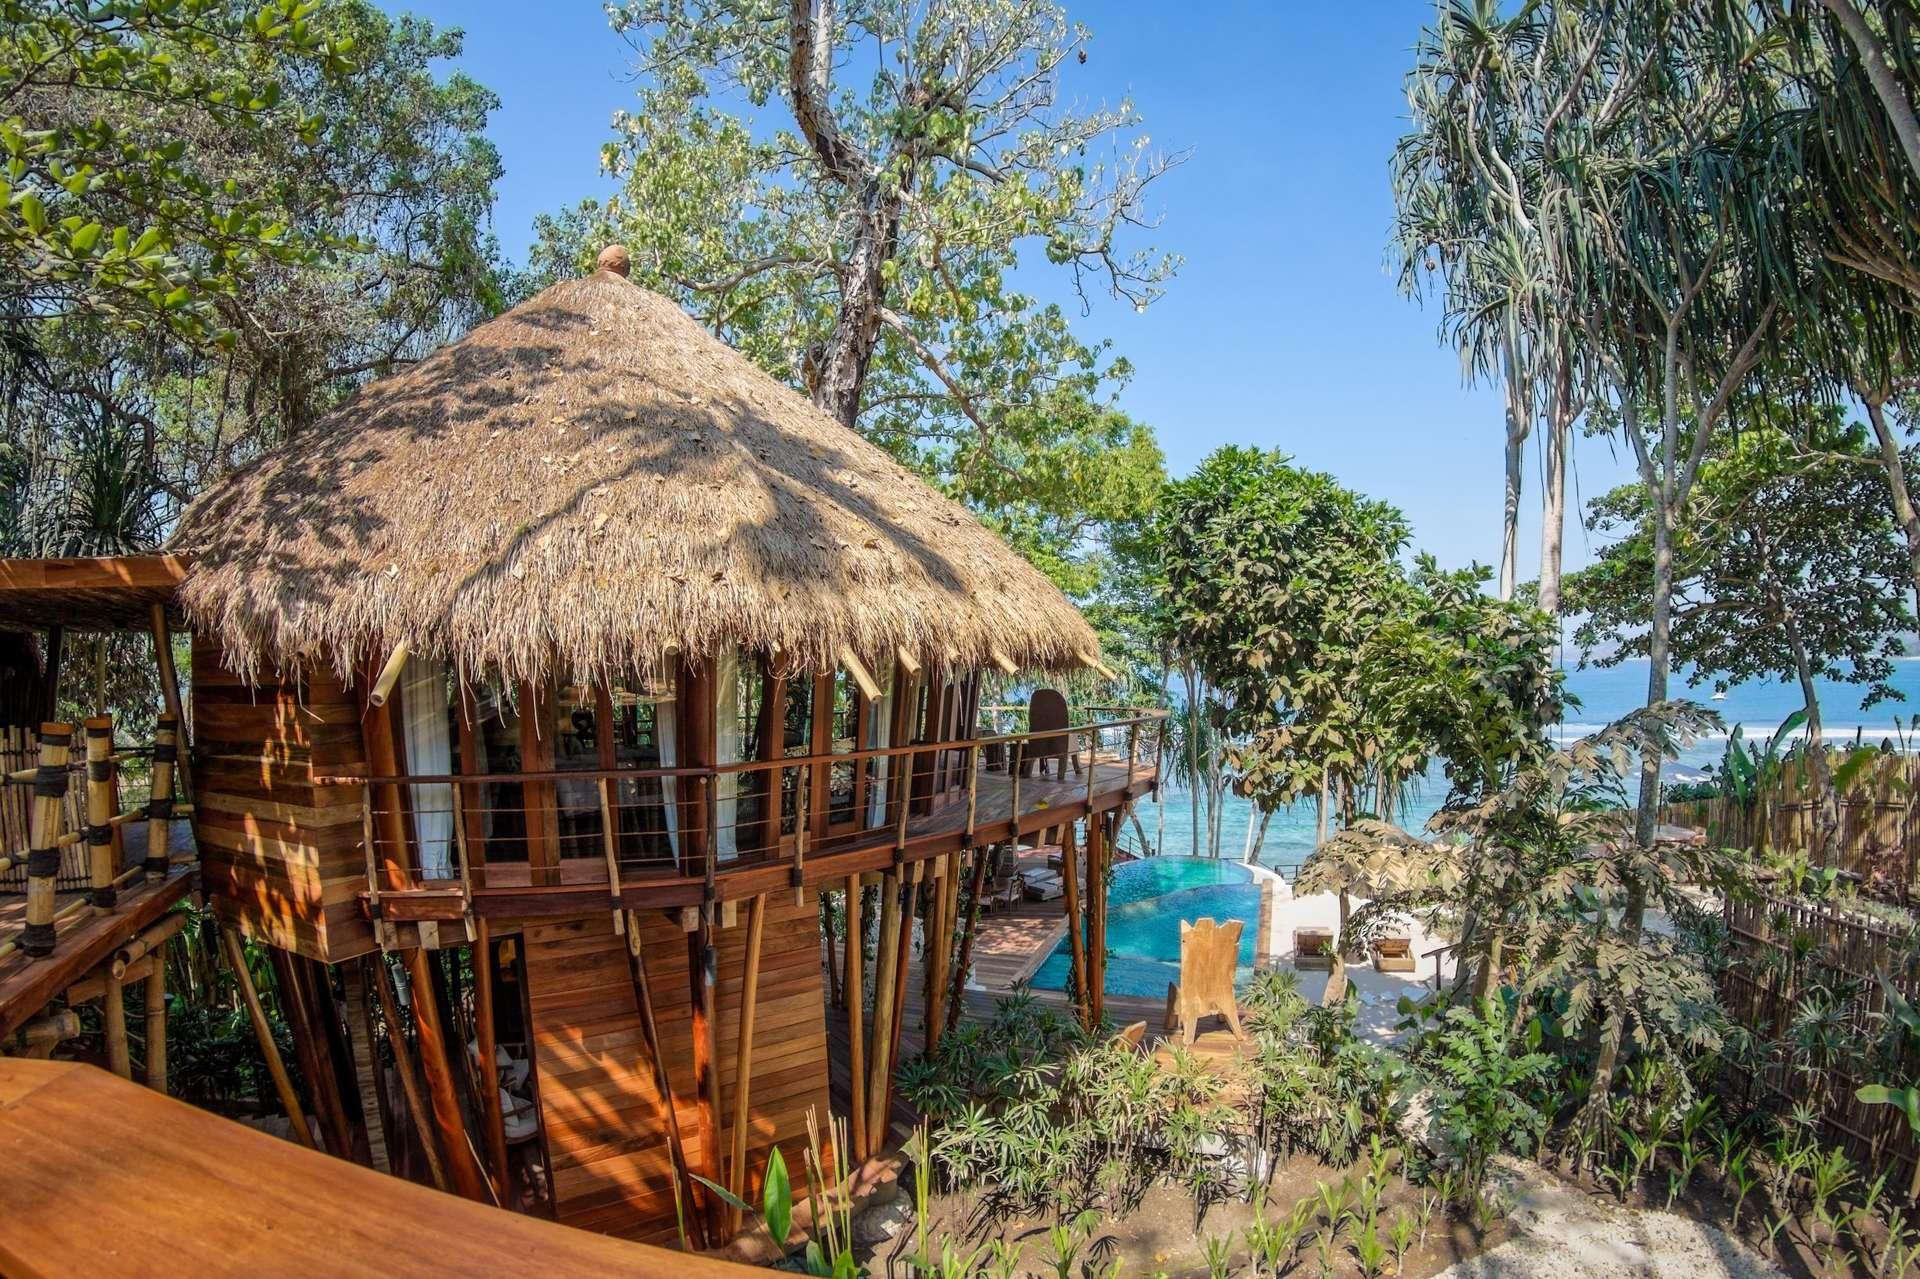 Luxury villa rentals asia - Indonesia - Sumba - Nihi sumba - Mamole Tree House - Image 1/14